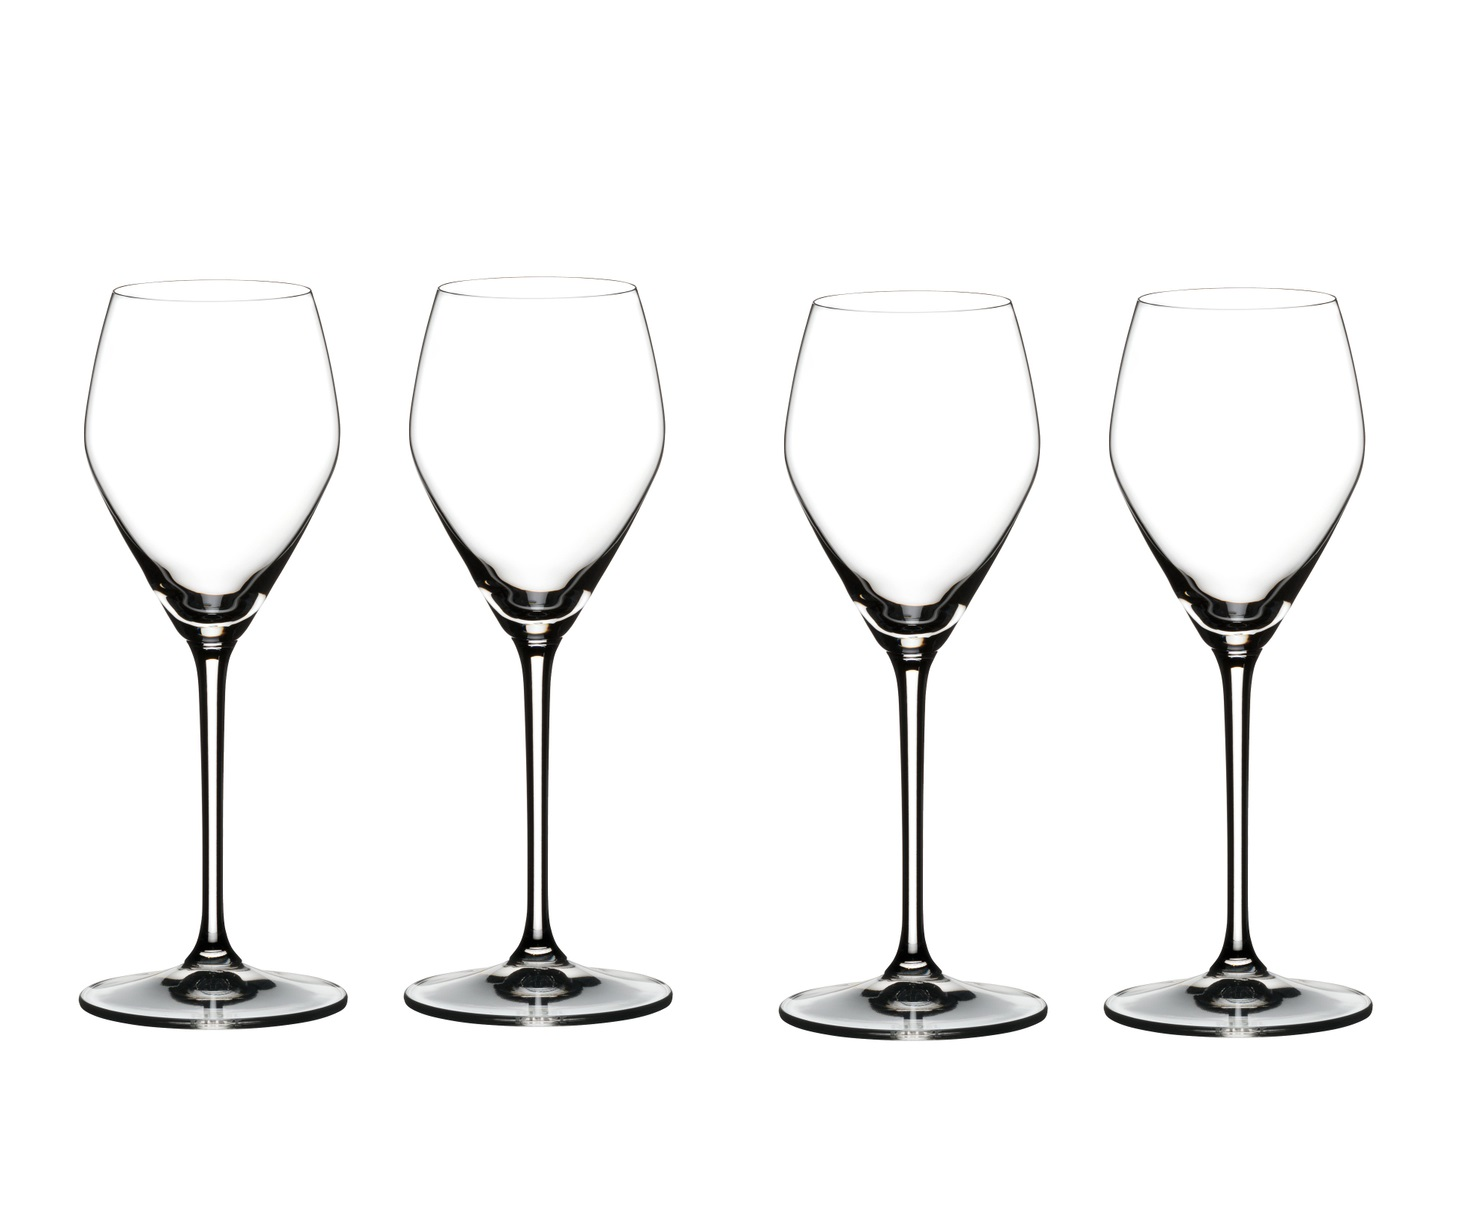 Онлайн каталог PROMENU: Набор бокалов для PROSECCO Riedel, объем 0,46 л, 4 штуки                               5441/85